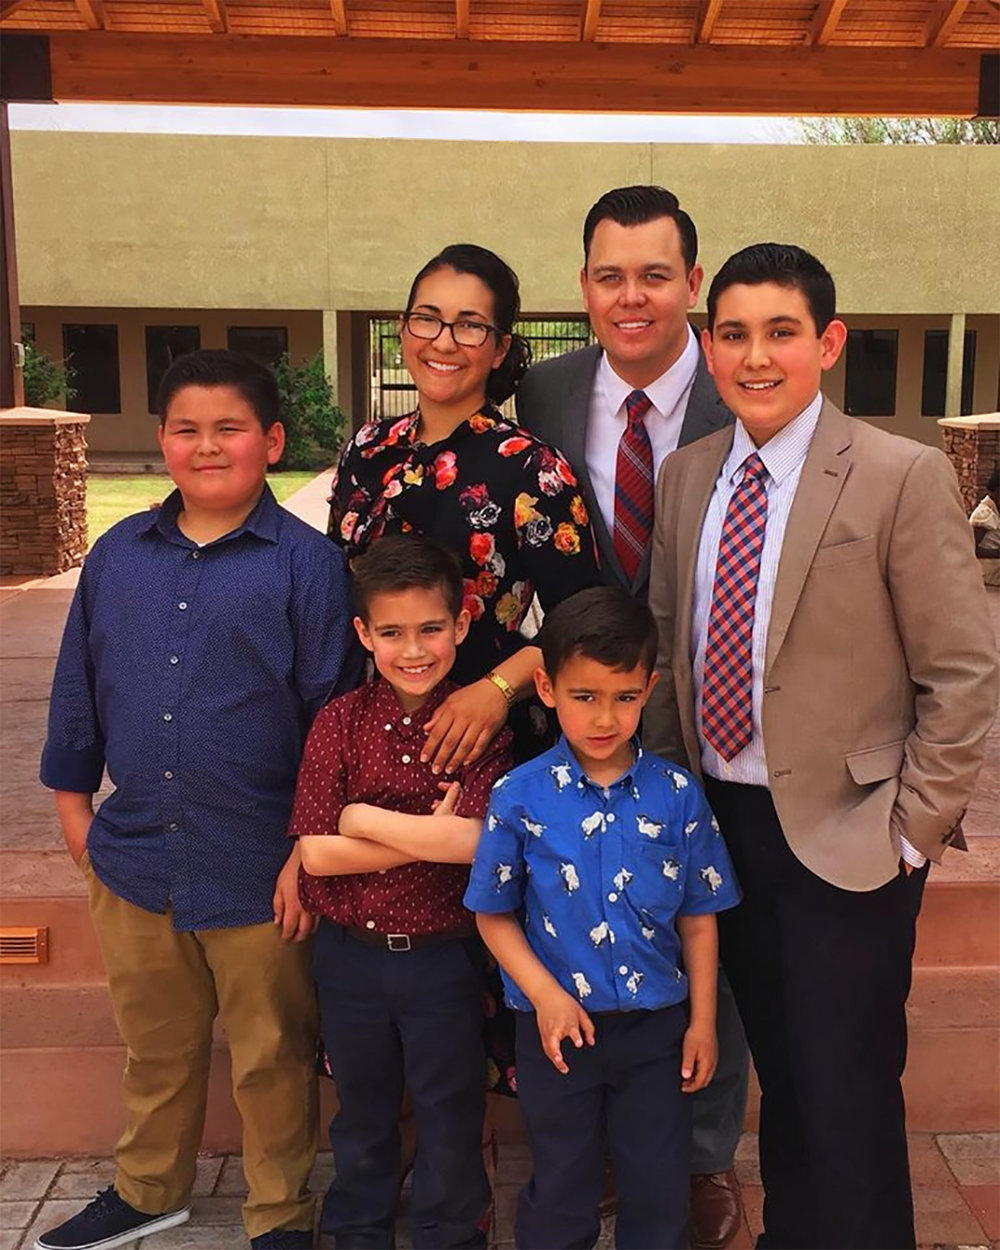 Jeremiah Lopez Family.jpg